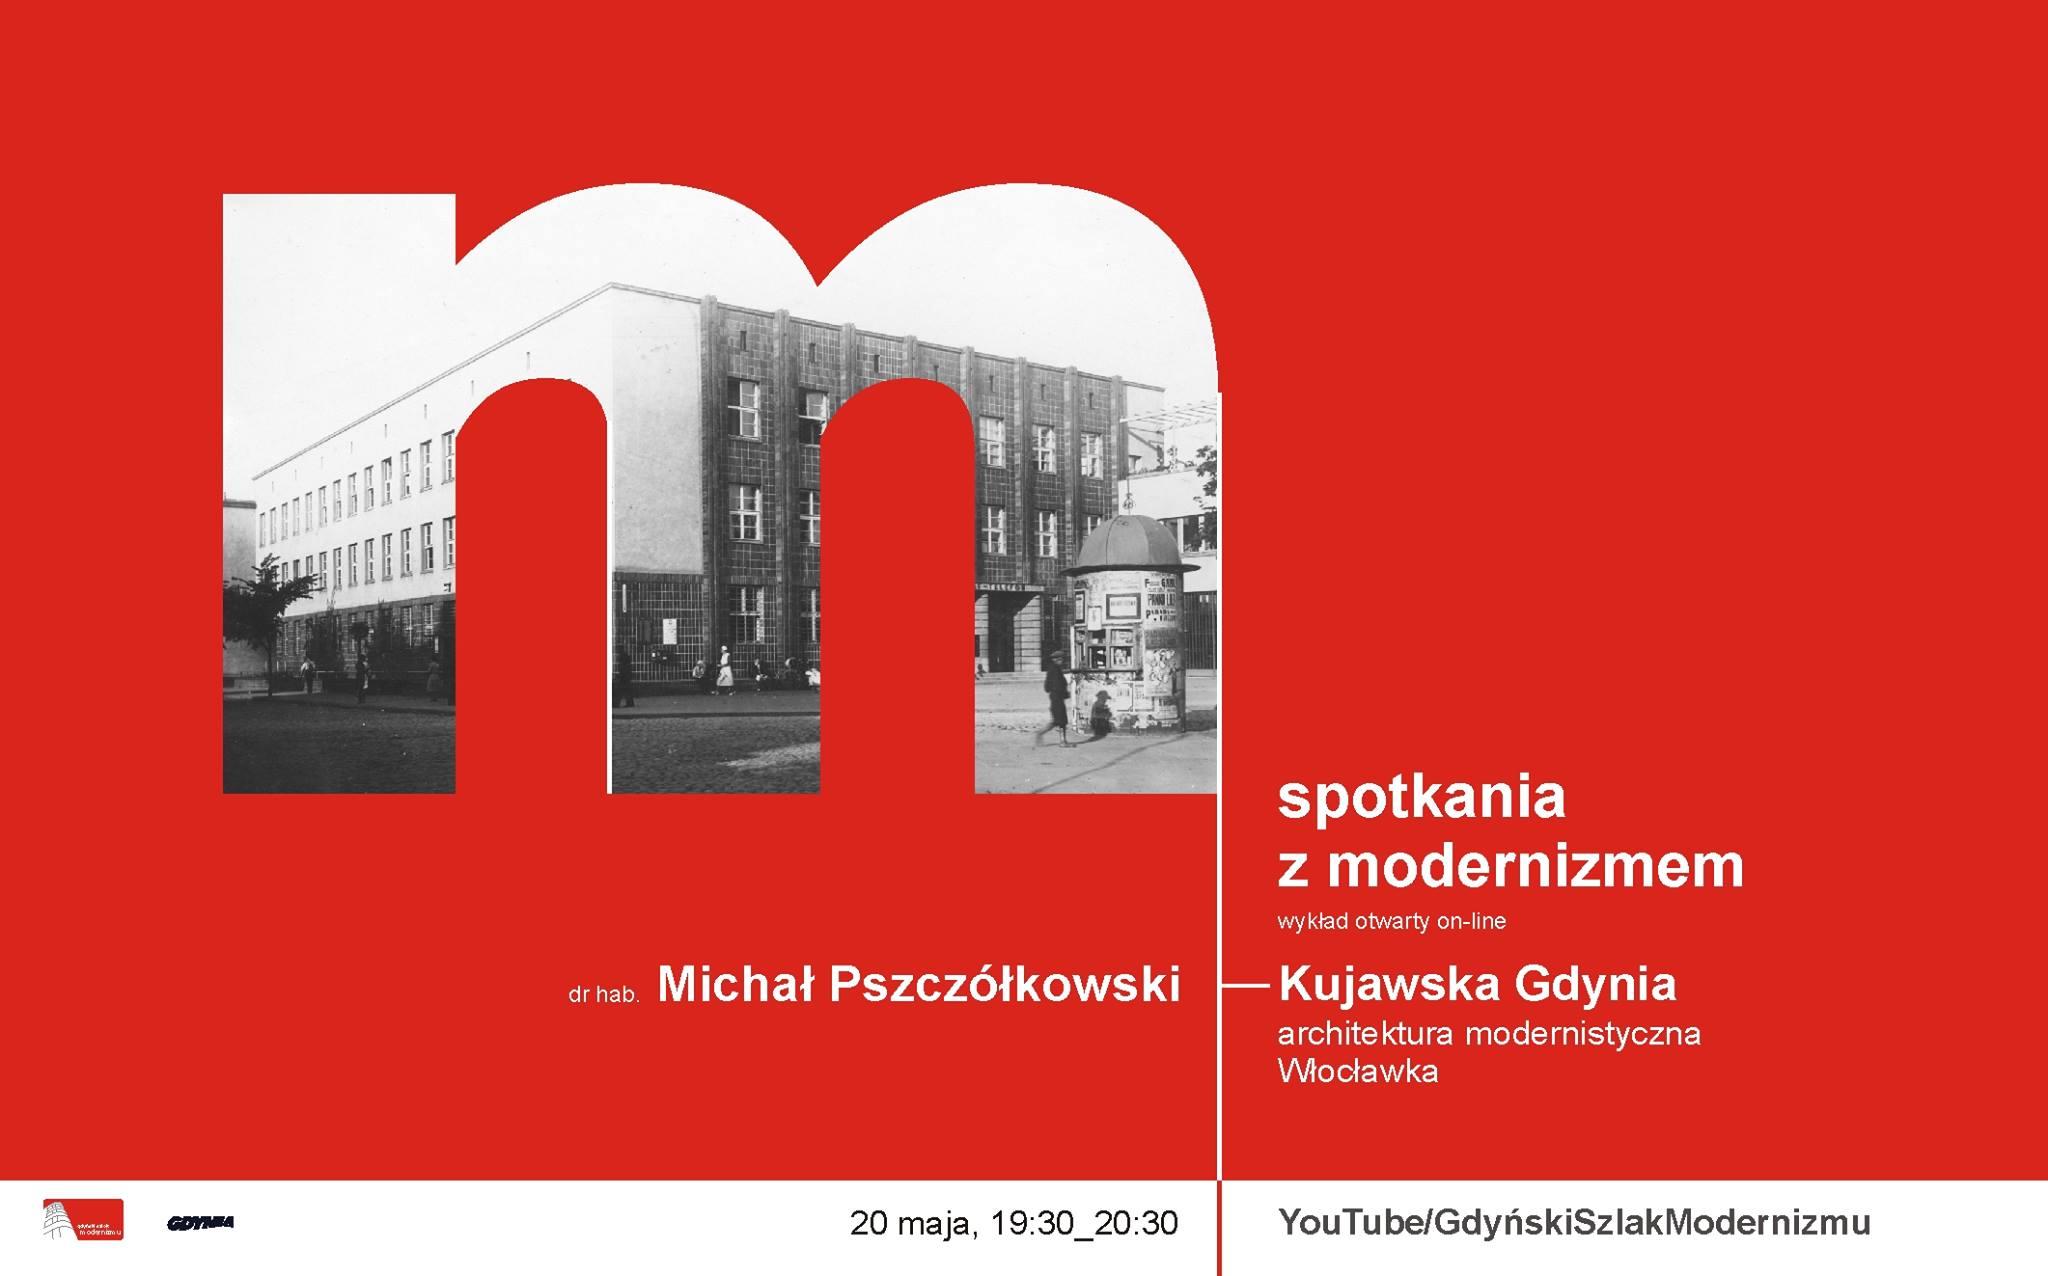 Miasta i architektura – Kujawska Gdynia